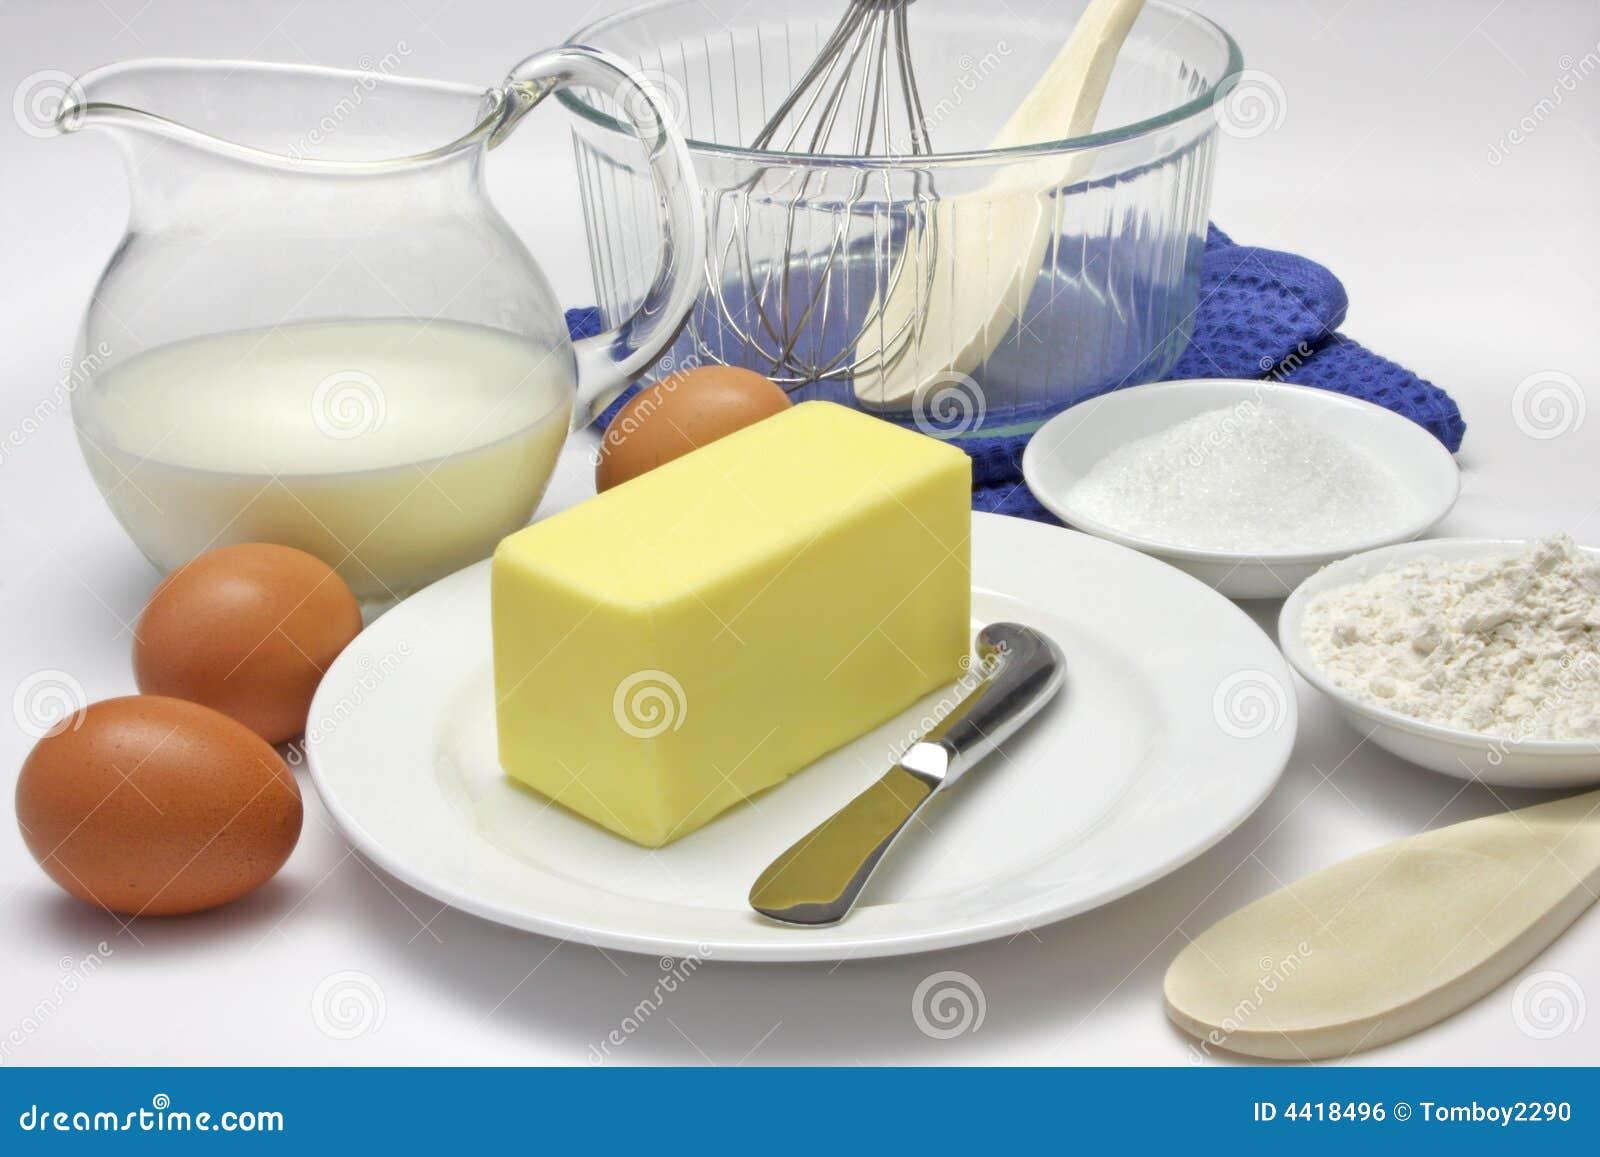 cake ingredients stock photo image of white tools